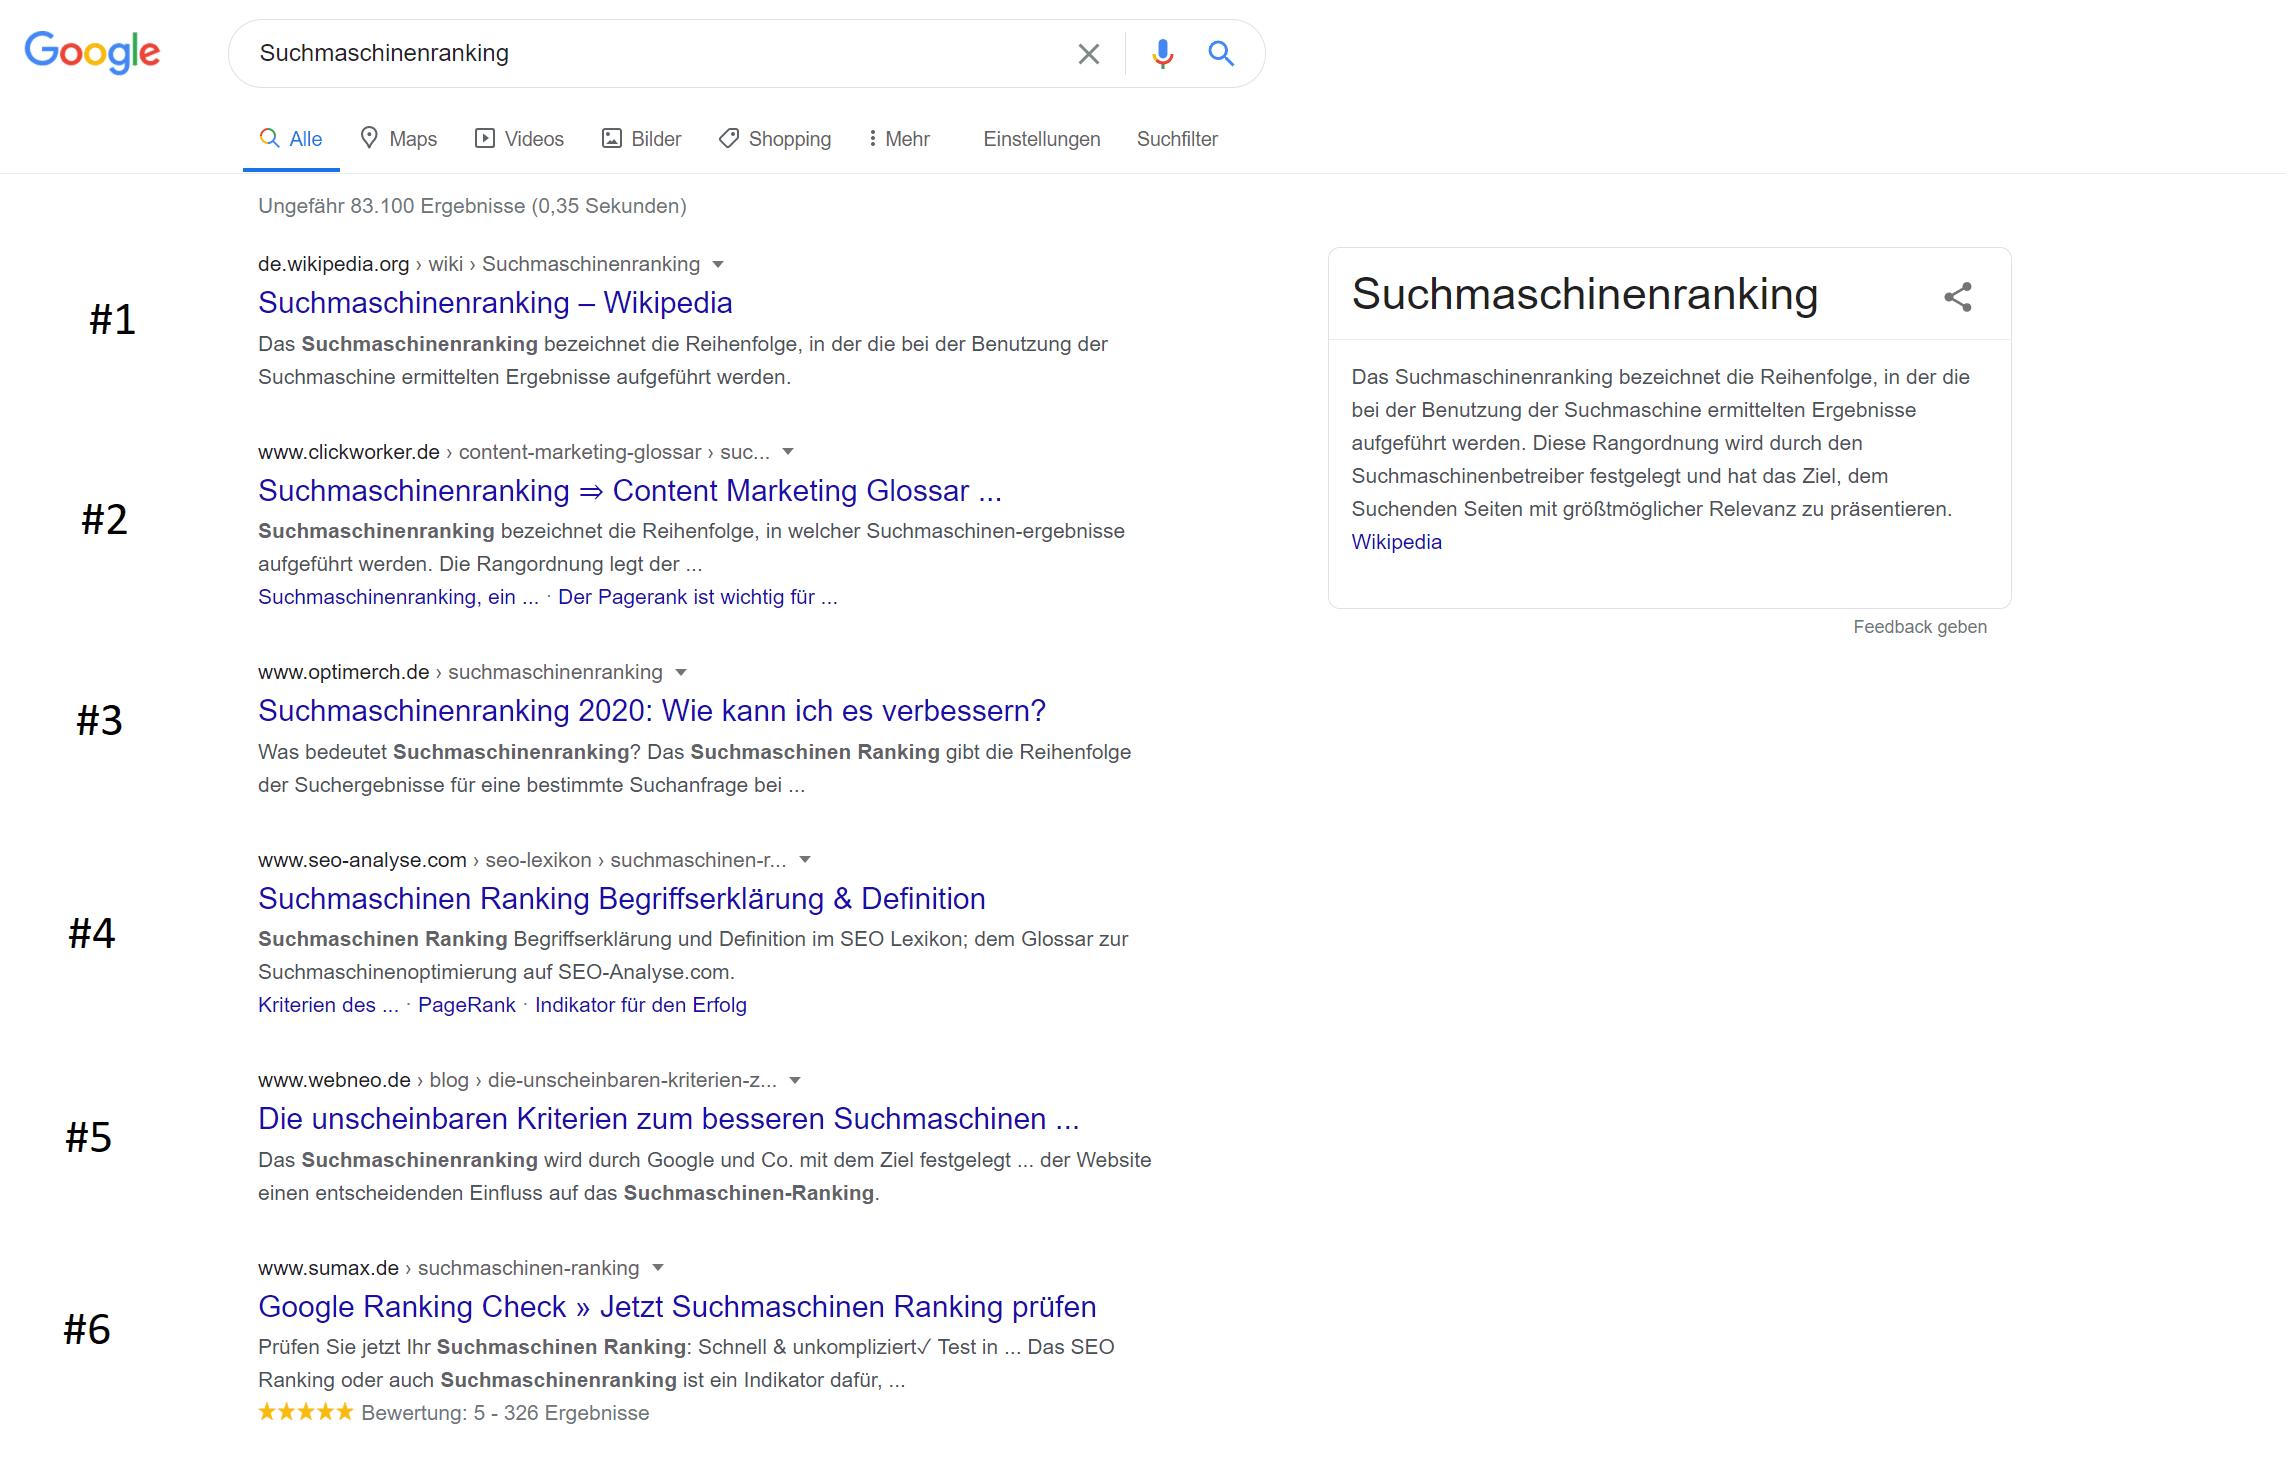 Suchmaschinenranking Google